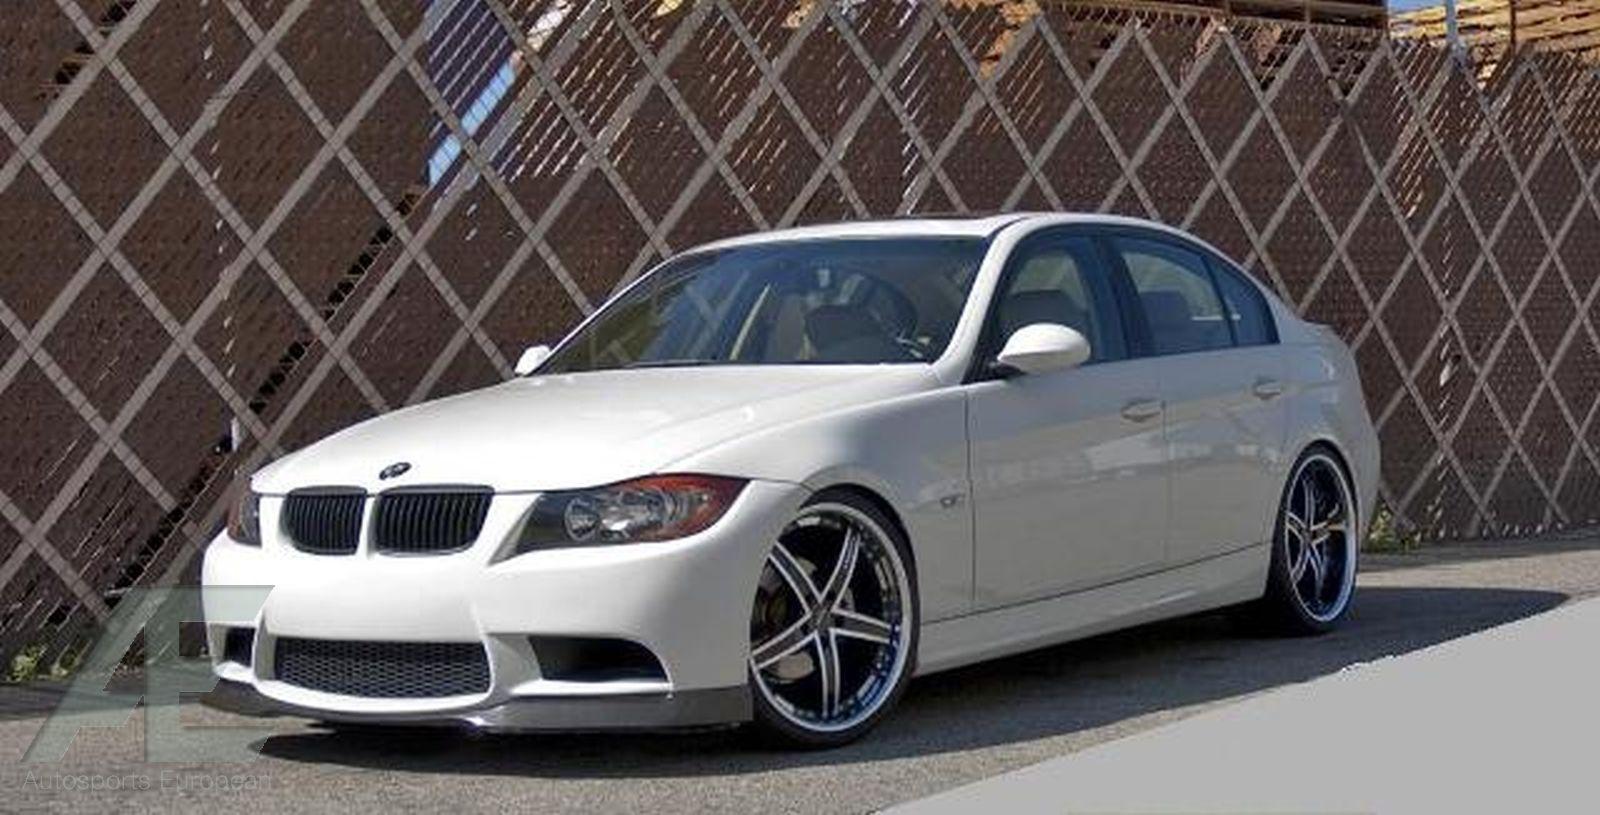 19 BMW Wheels Rim Tires 328i 328xi 330i 330CI 330xi X3